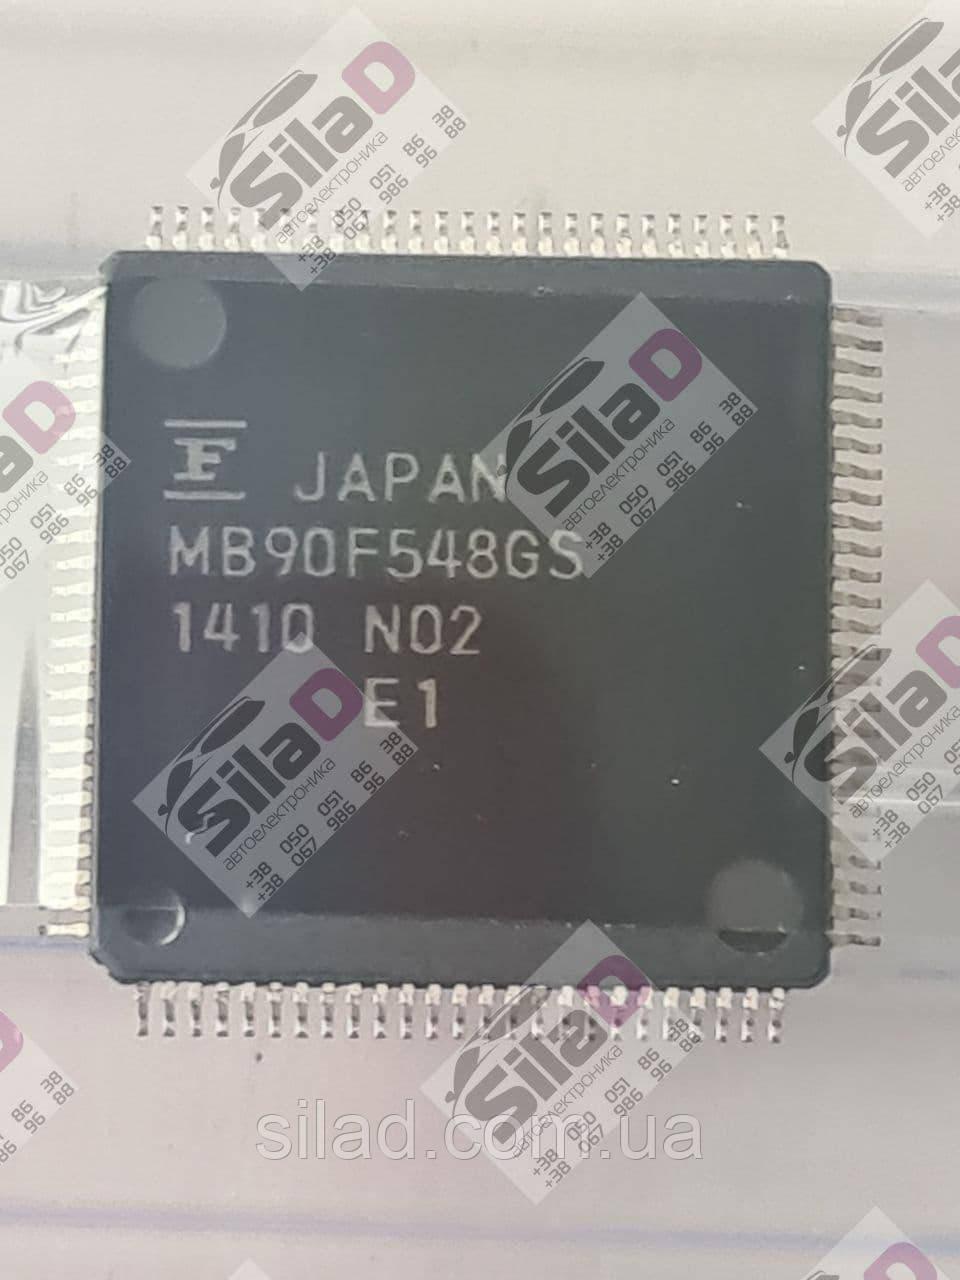 Микроконтроллер MB90F548GS Fujitsu Microelectronic корпус LQFP100